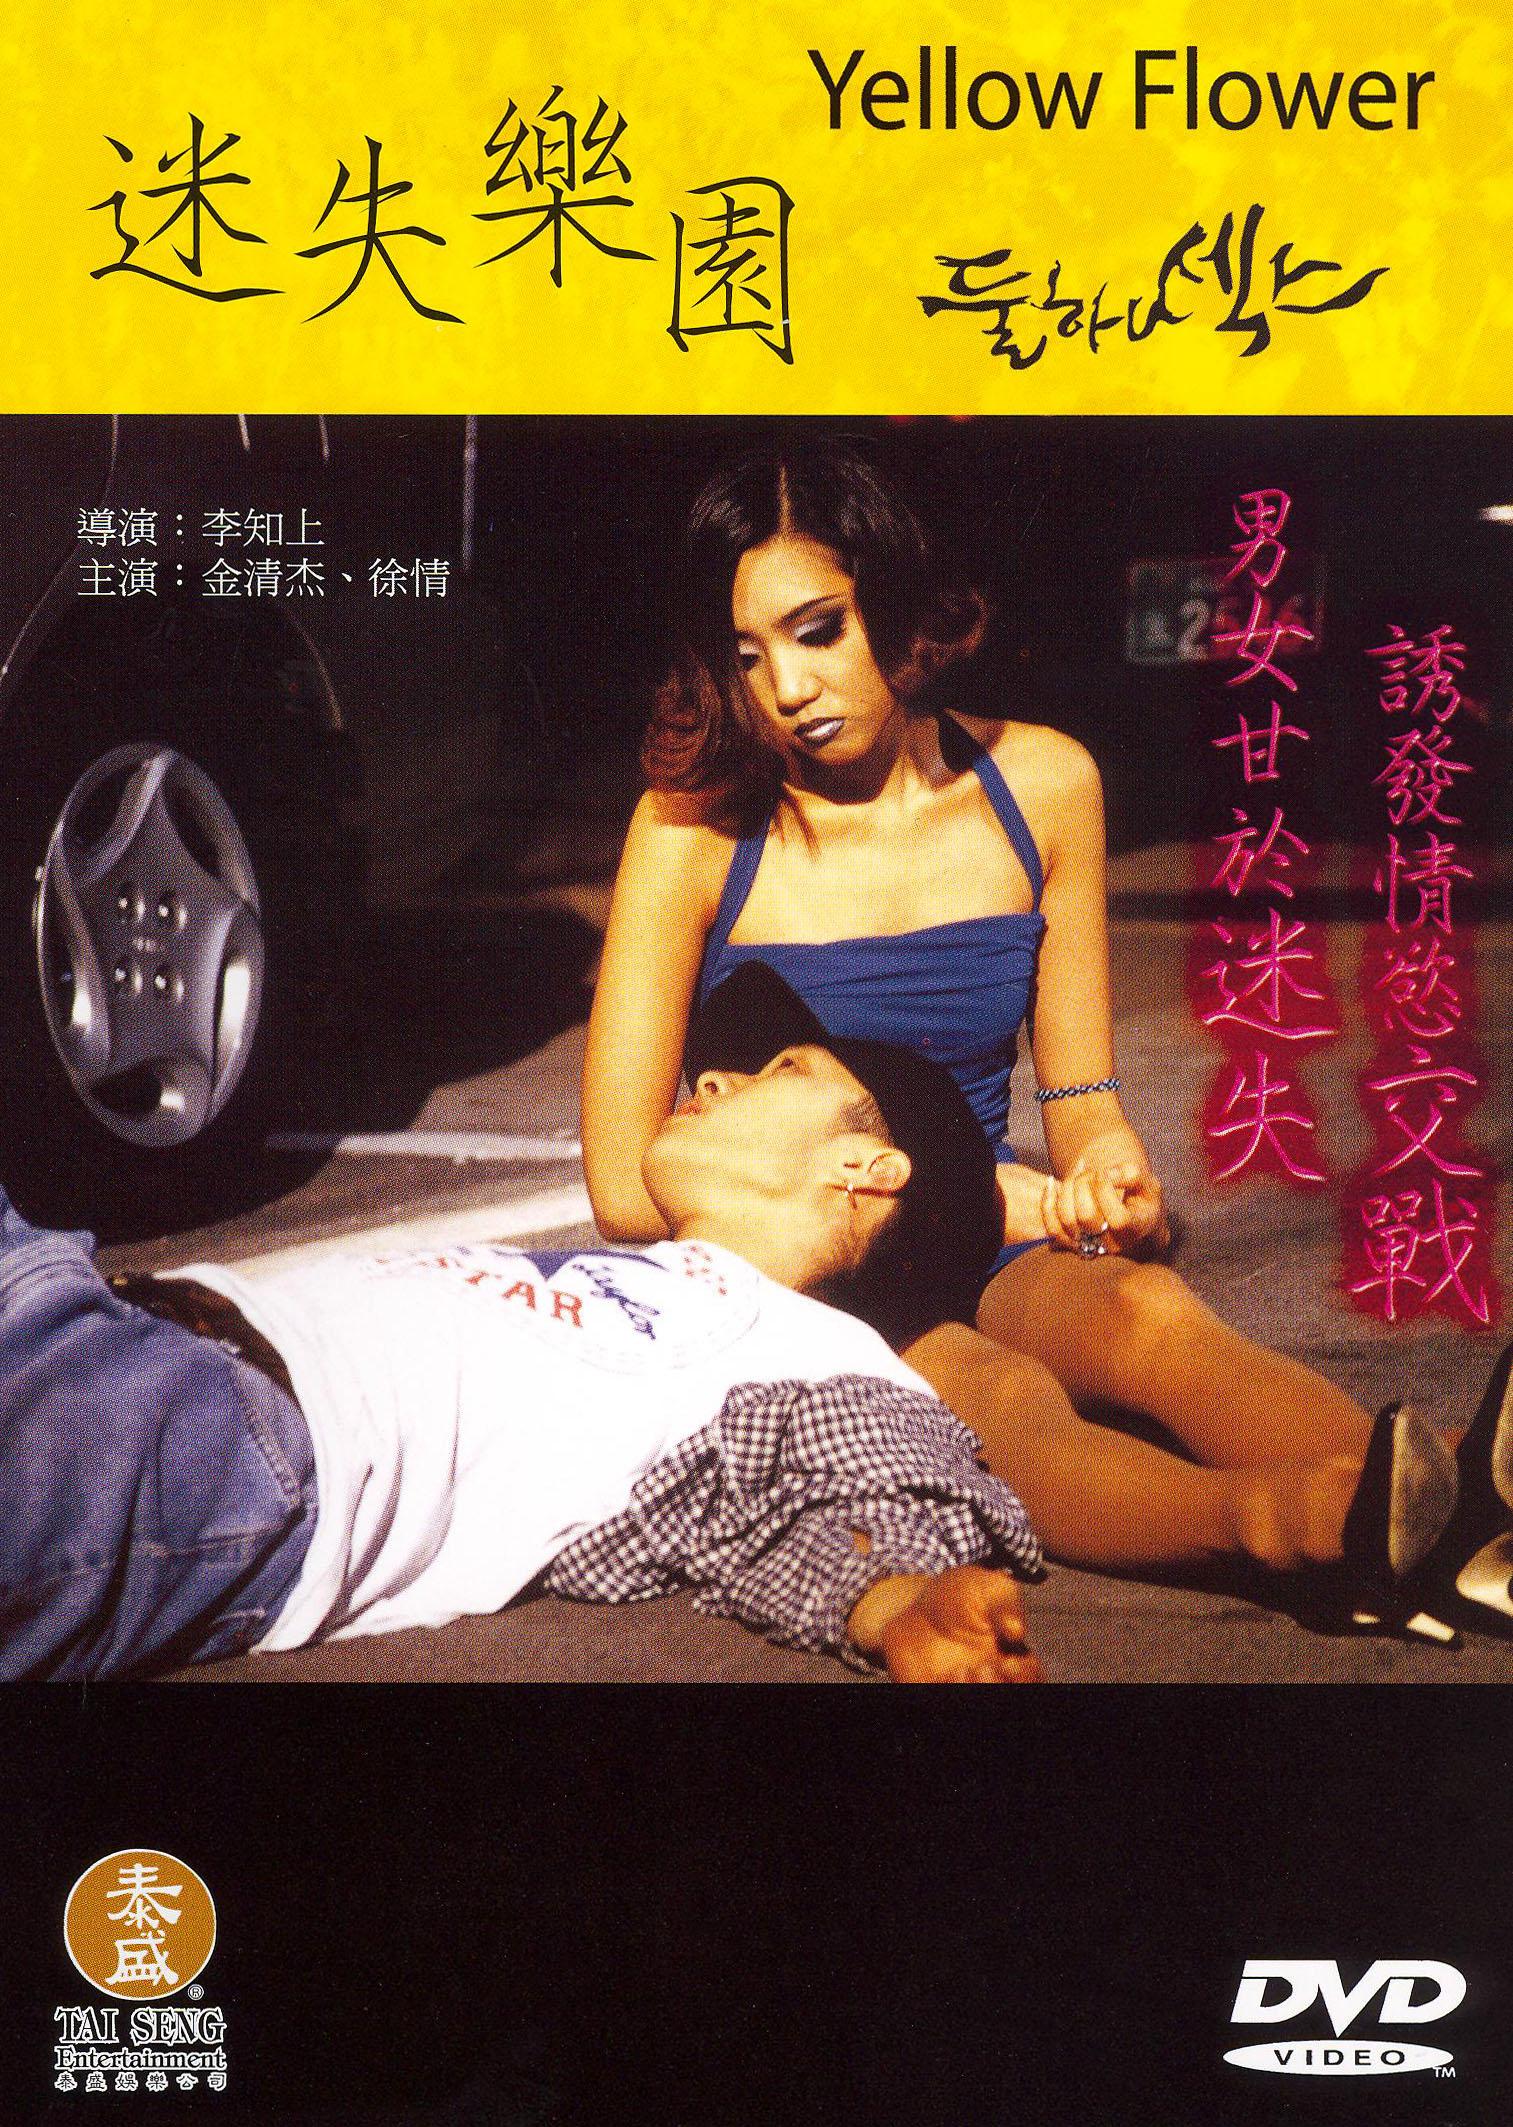 Yellow flower 2002 synopsis characteristics moods themes yellow flower mightylinksfo